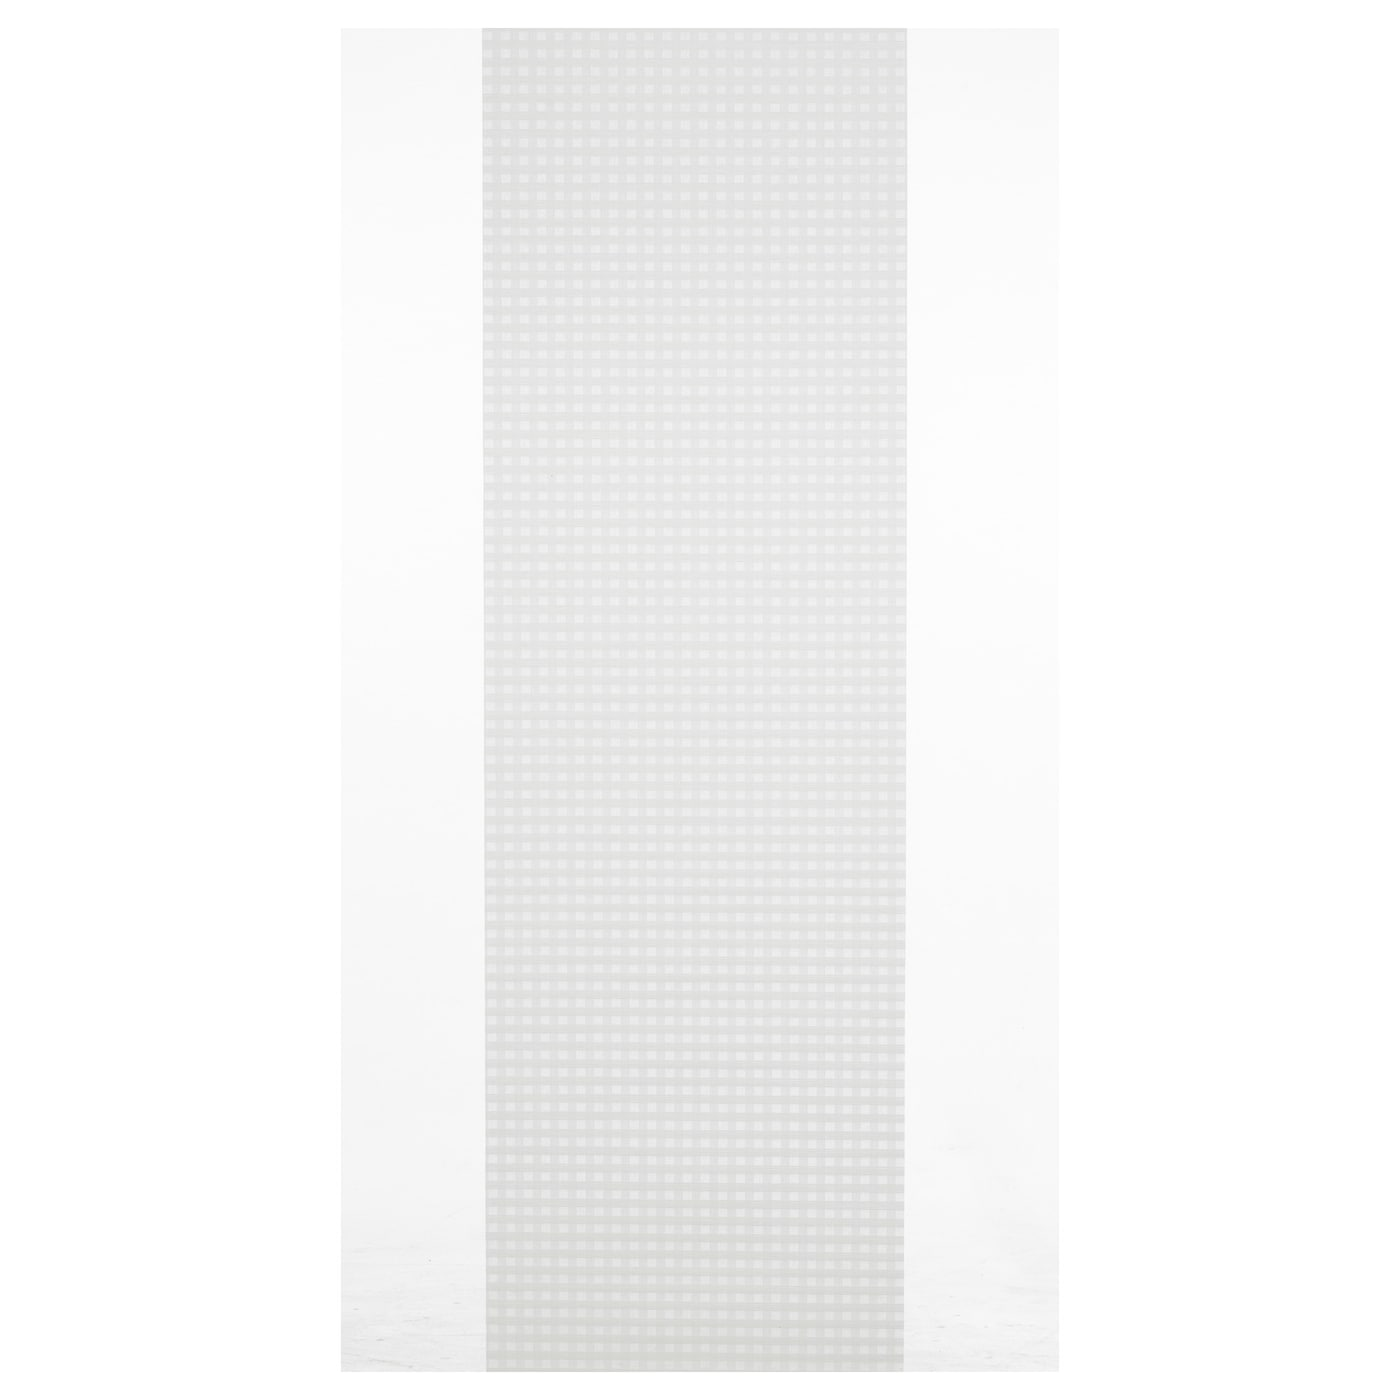 ingamaj panel curtain white 60x300 cm ikea. Black Bedroom Furniture Sets. Home Design Ideas